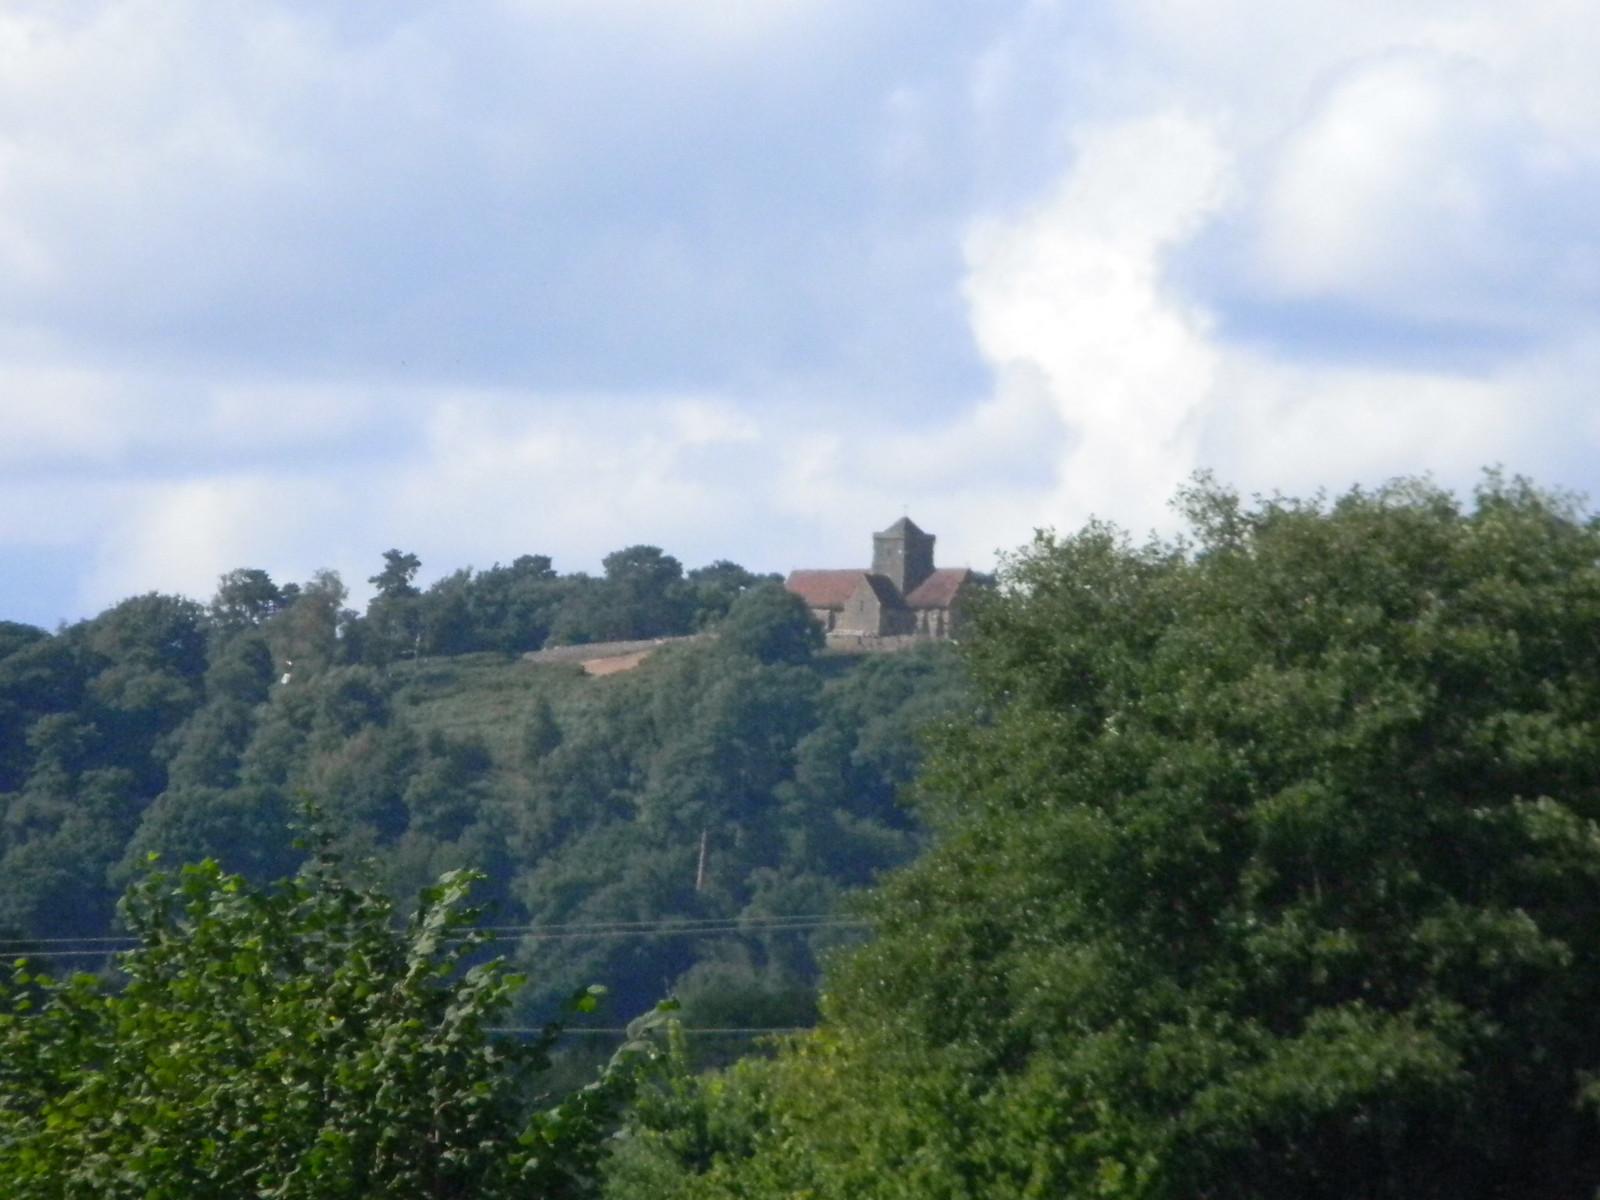 St Martha's on the hill Guildford Circular via Albury.